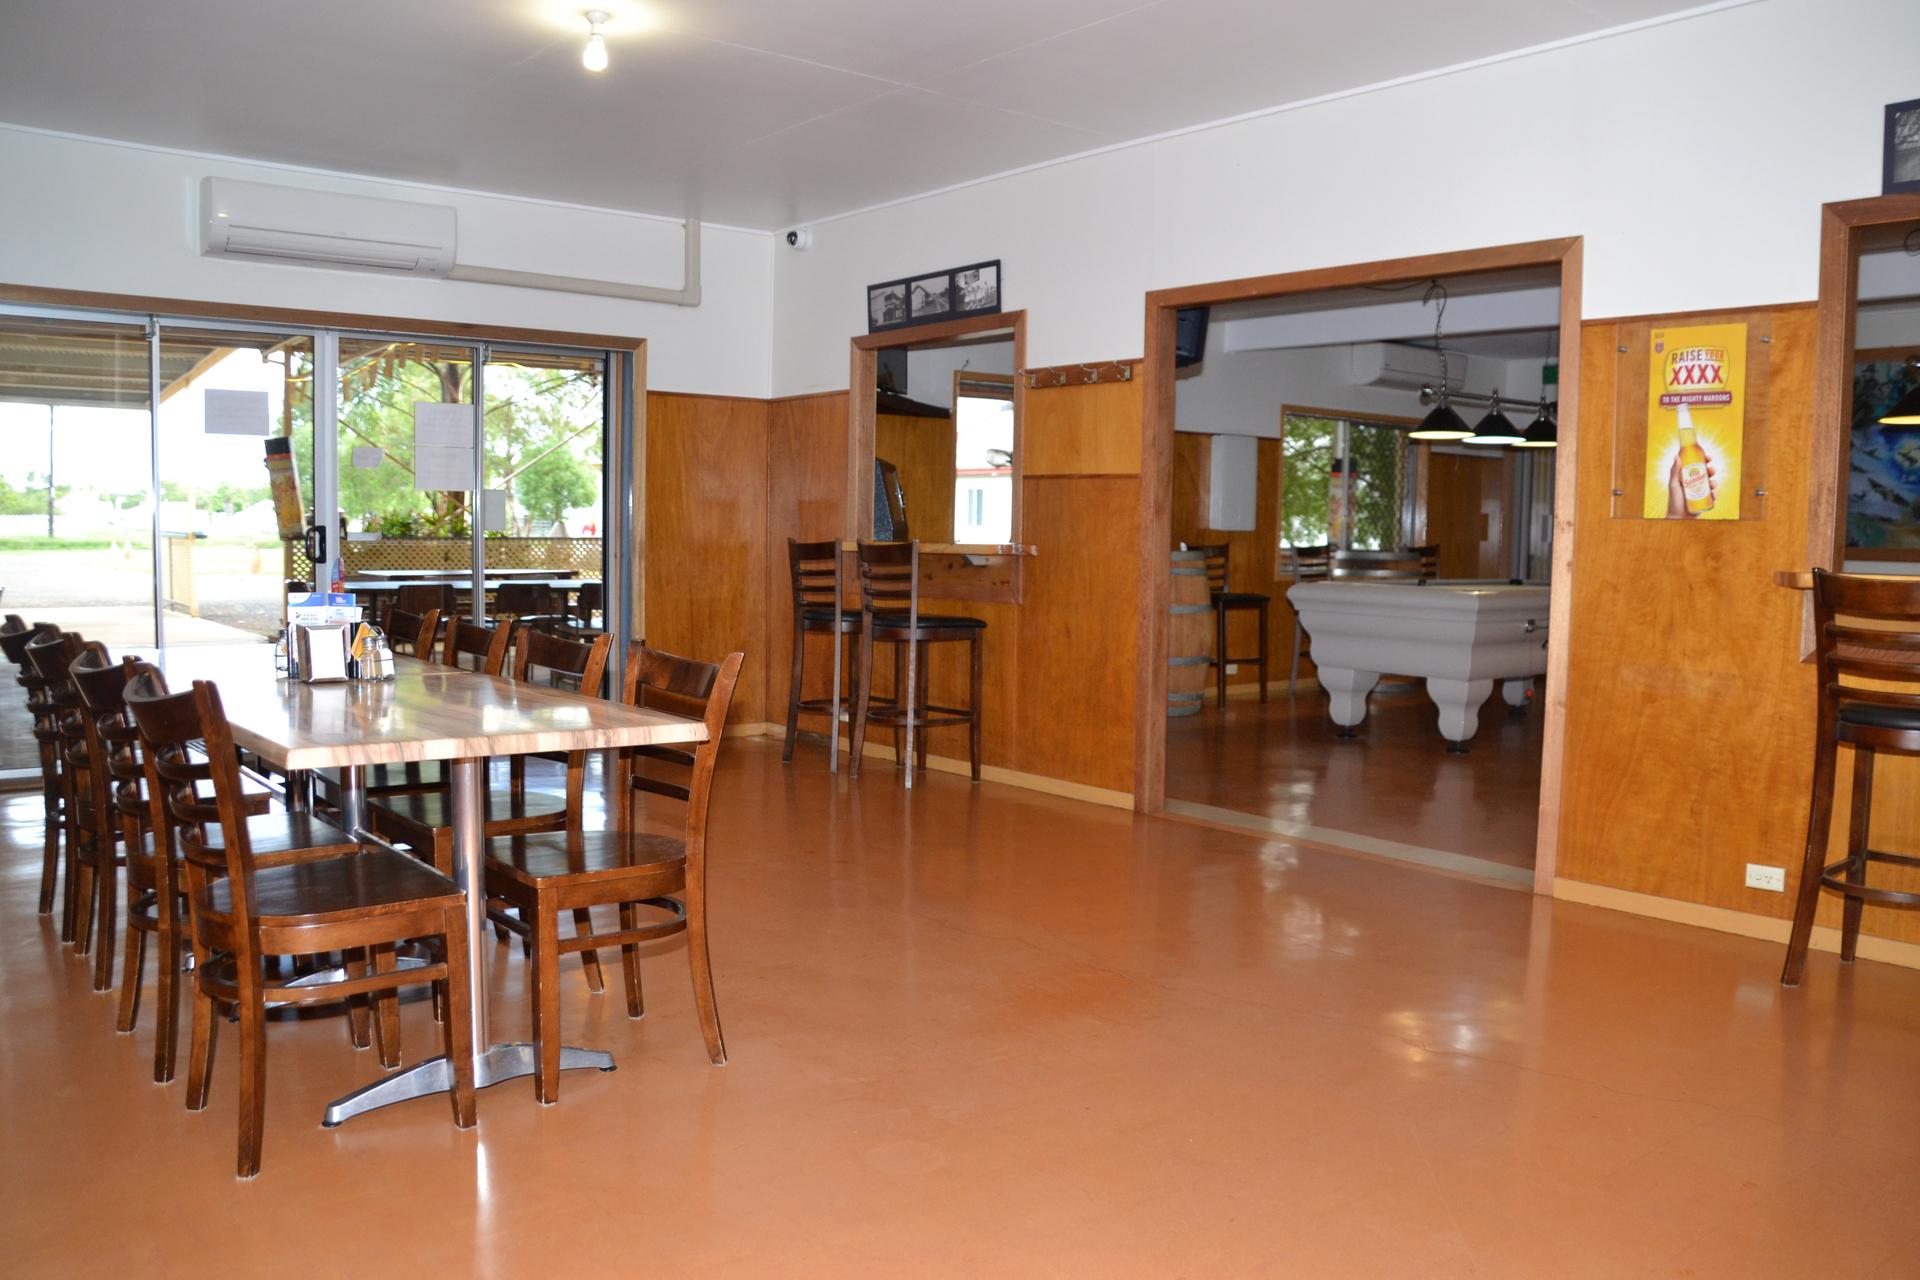 a - Yuleba Hotel Motel and Diner